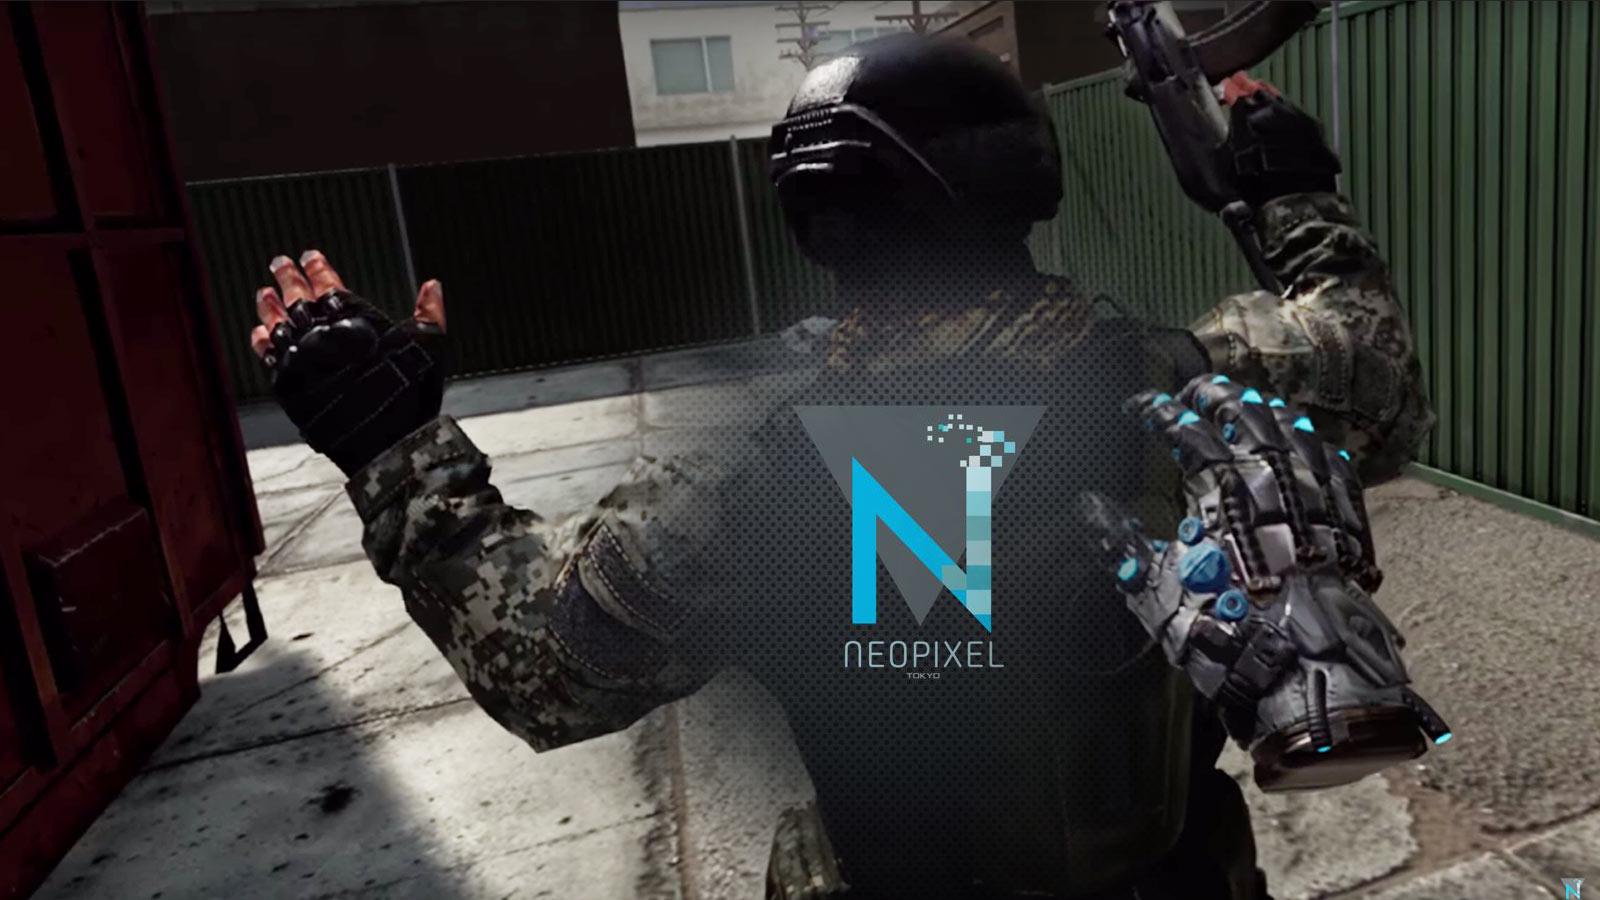 Neopixel Tokyo YouTube logo